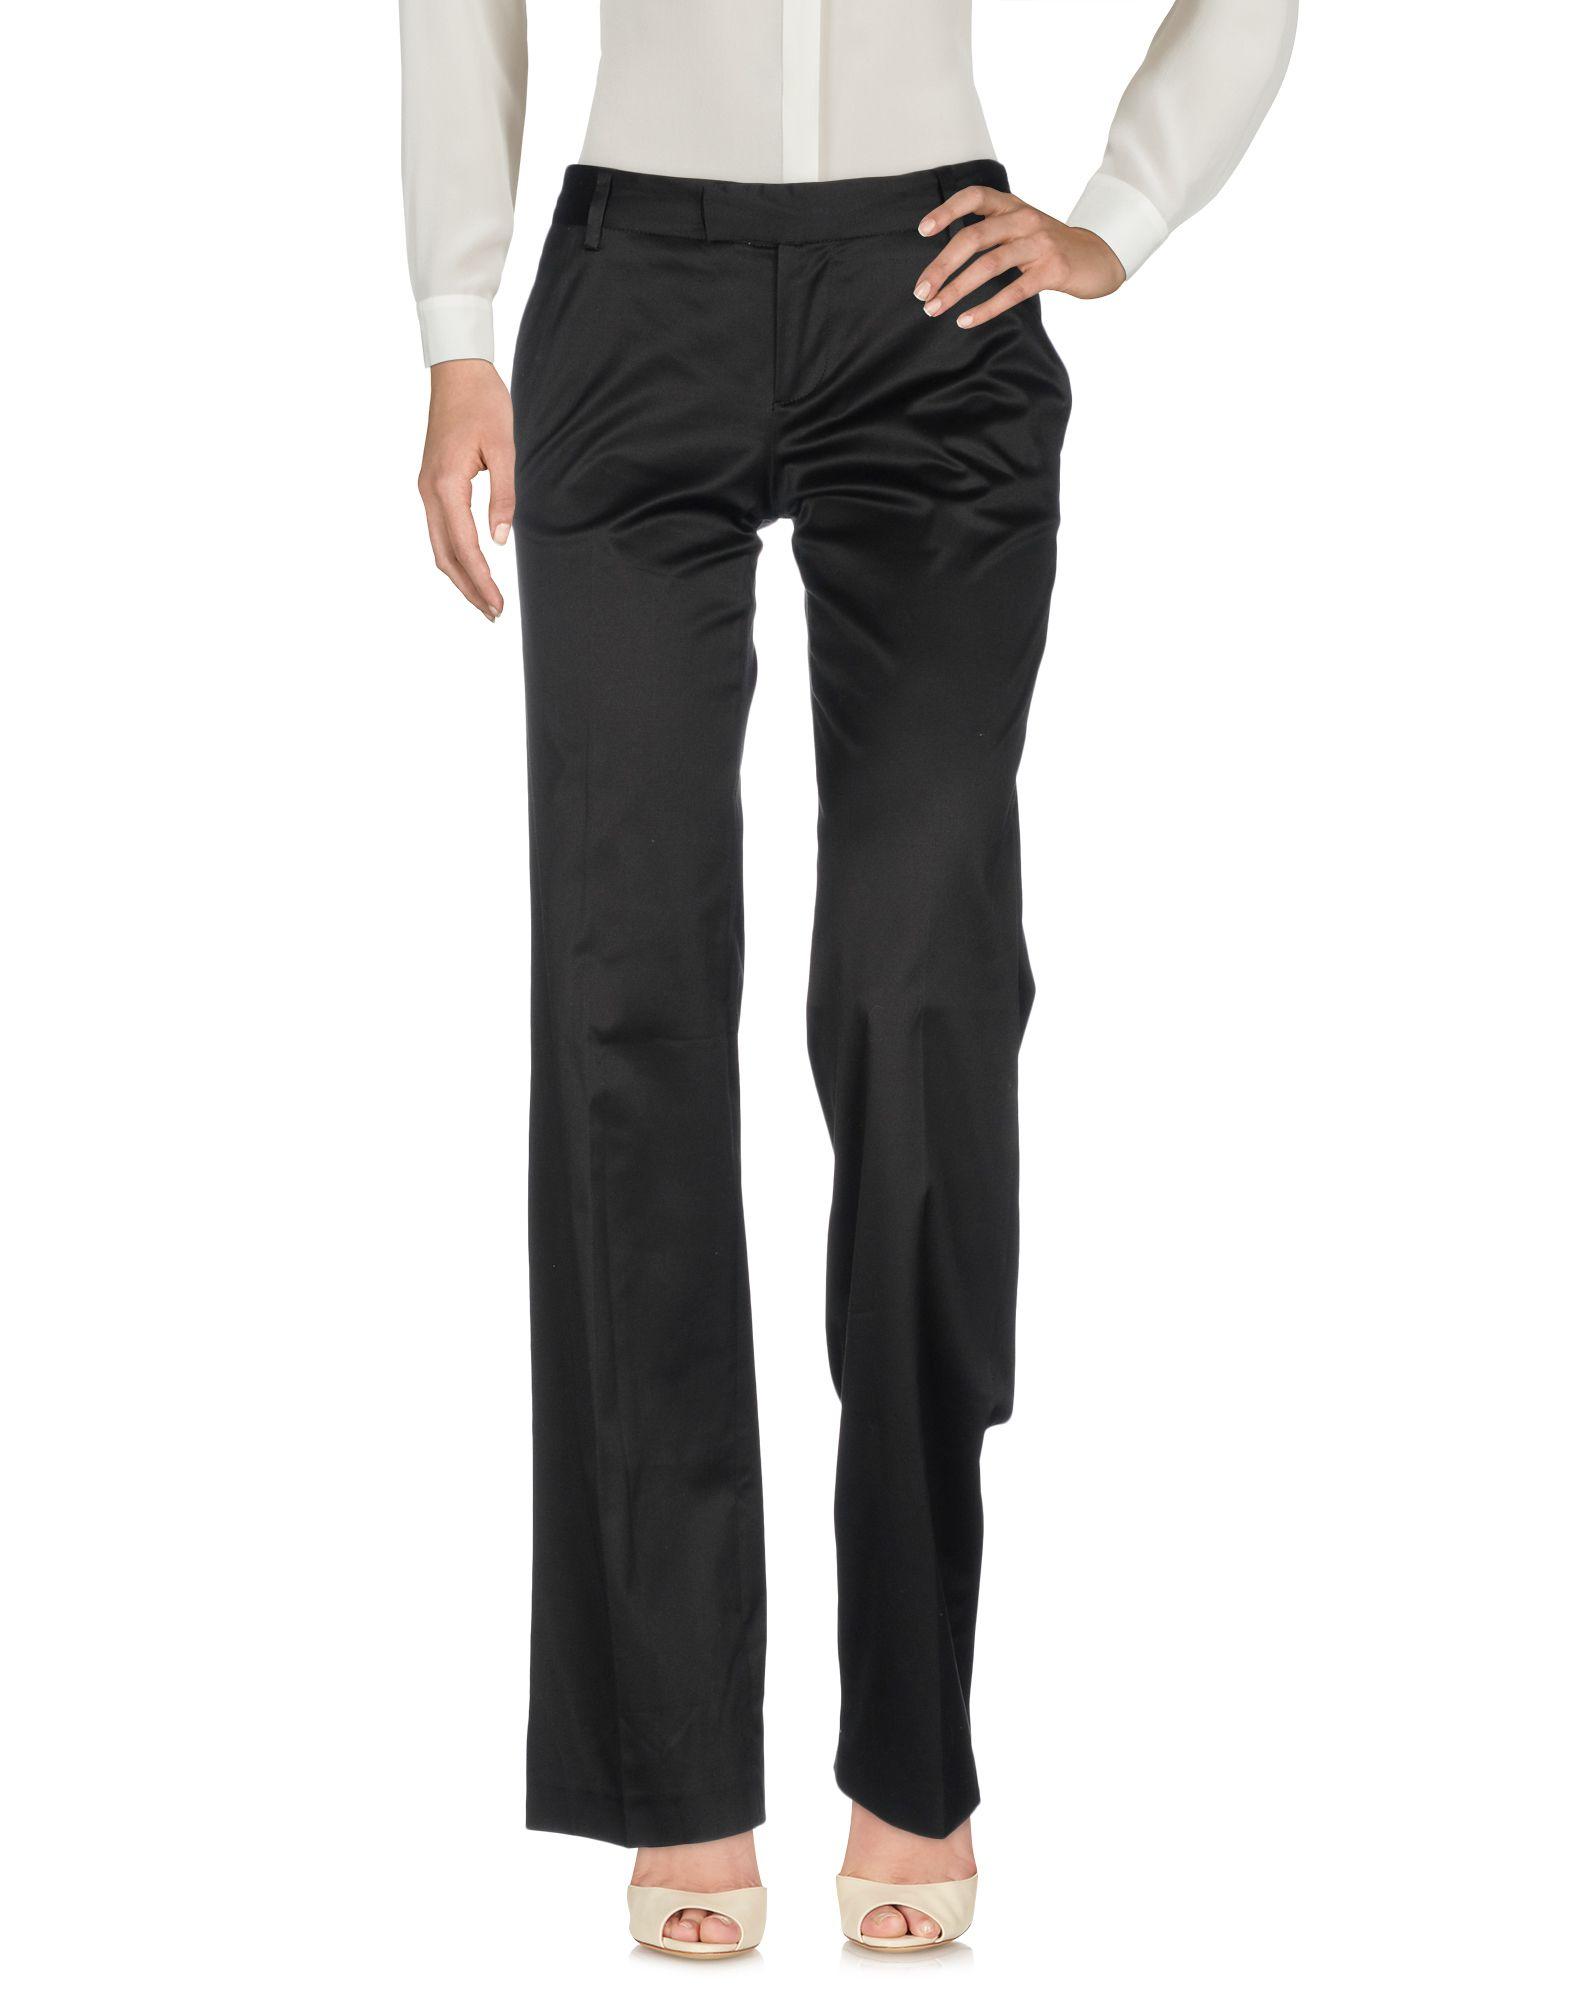 Pantalone Just Cavalli Donna - Acquista online su 7tgZt3lp